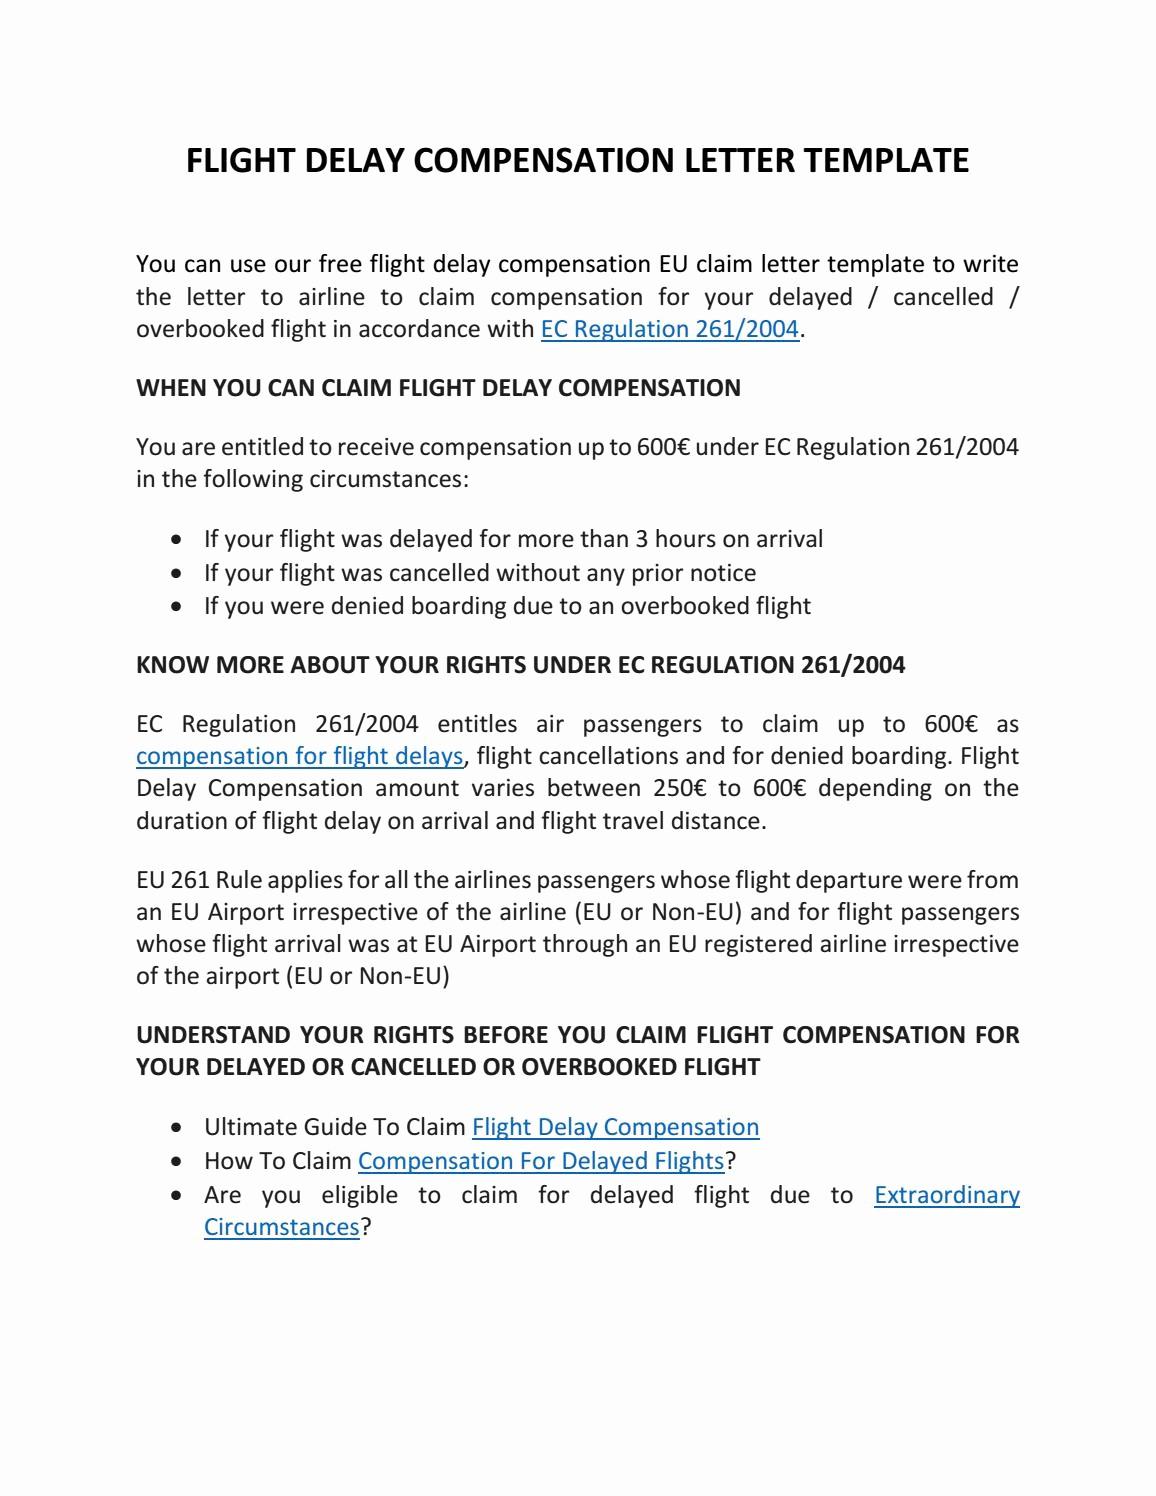 Claim Denial Letter Sample Airline Unique Flight Pensation Letter Template by Claim Flights issuu